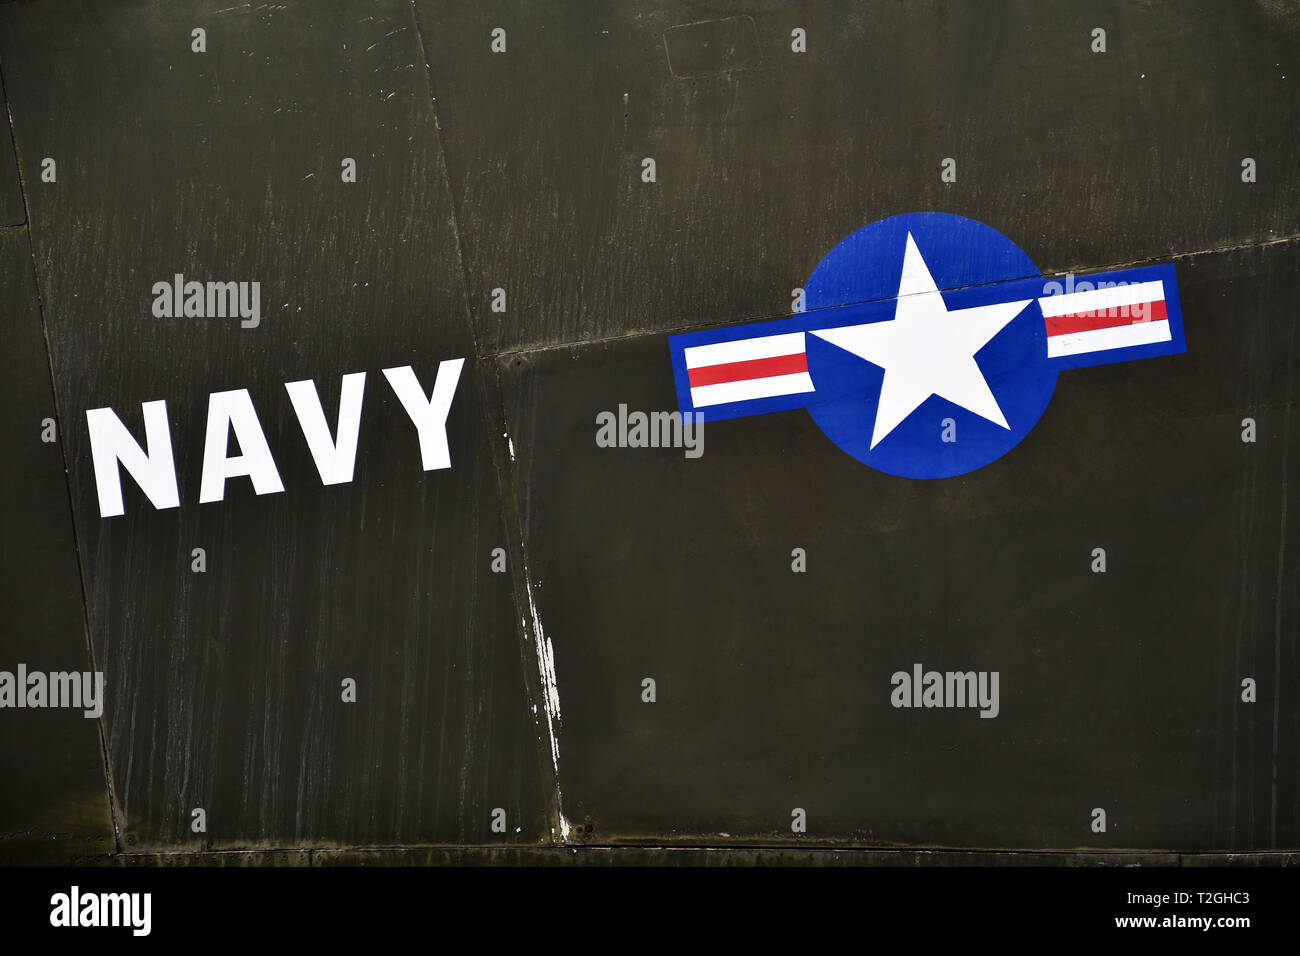 Usa Army Stock Photos & Usa Army Stock Images - Alamy